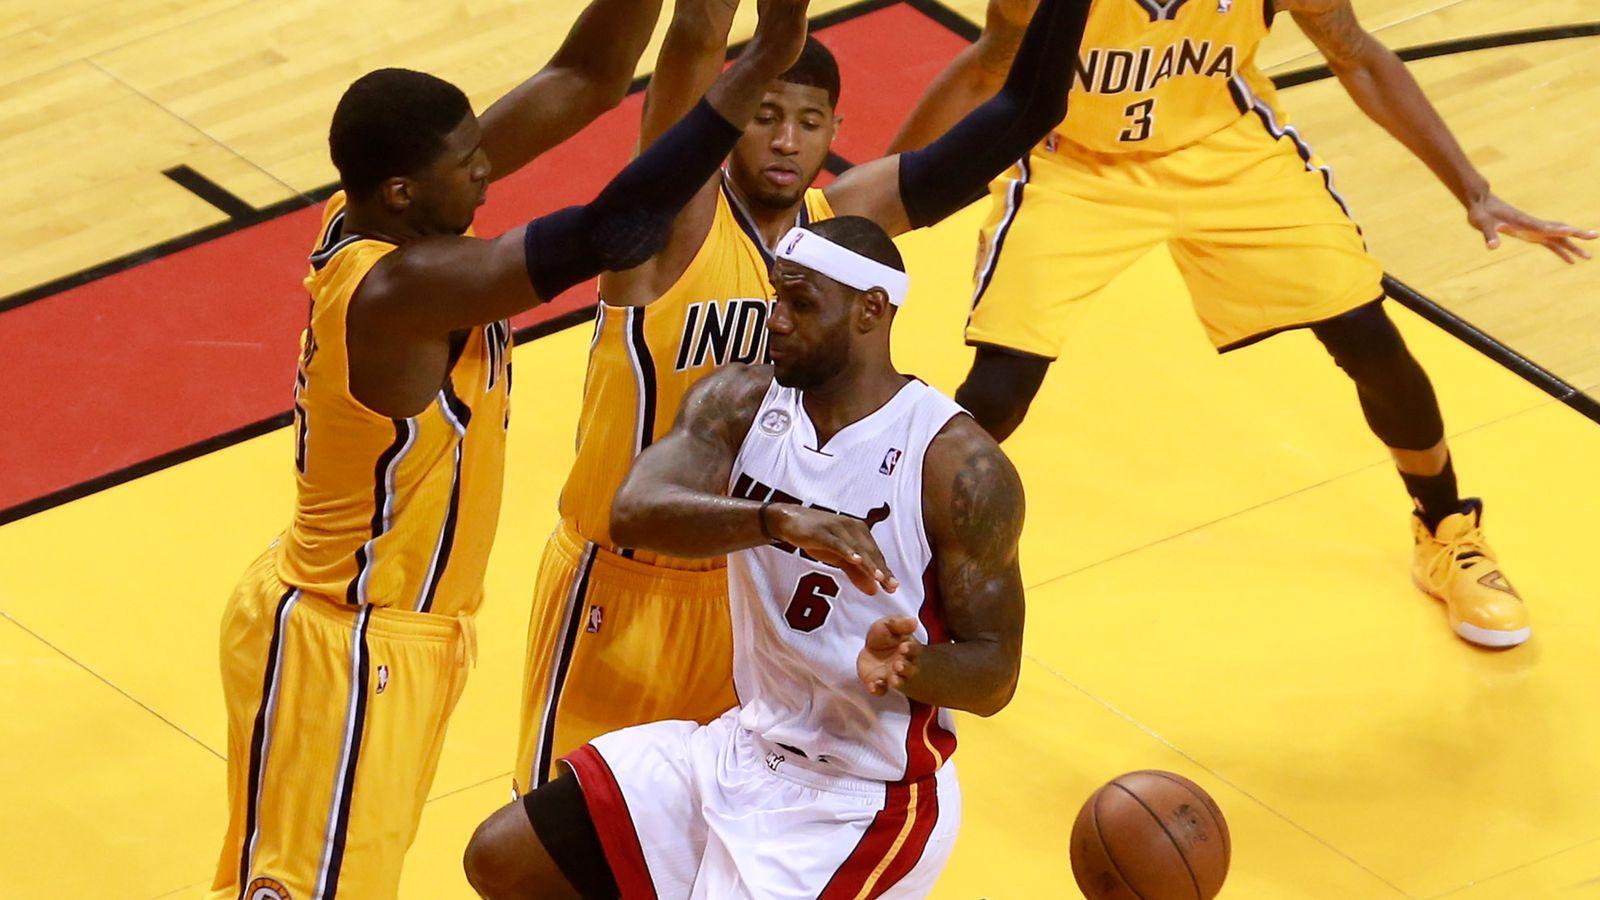 Nba Playoffs 2013 Roy Hibbert S Defense Helps Key Pacers